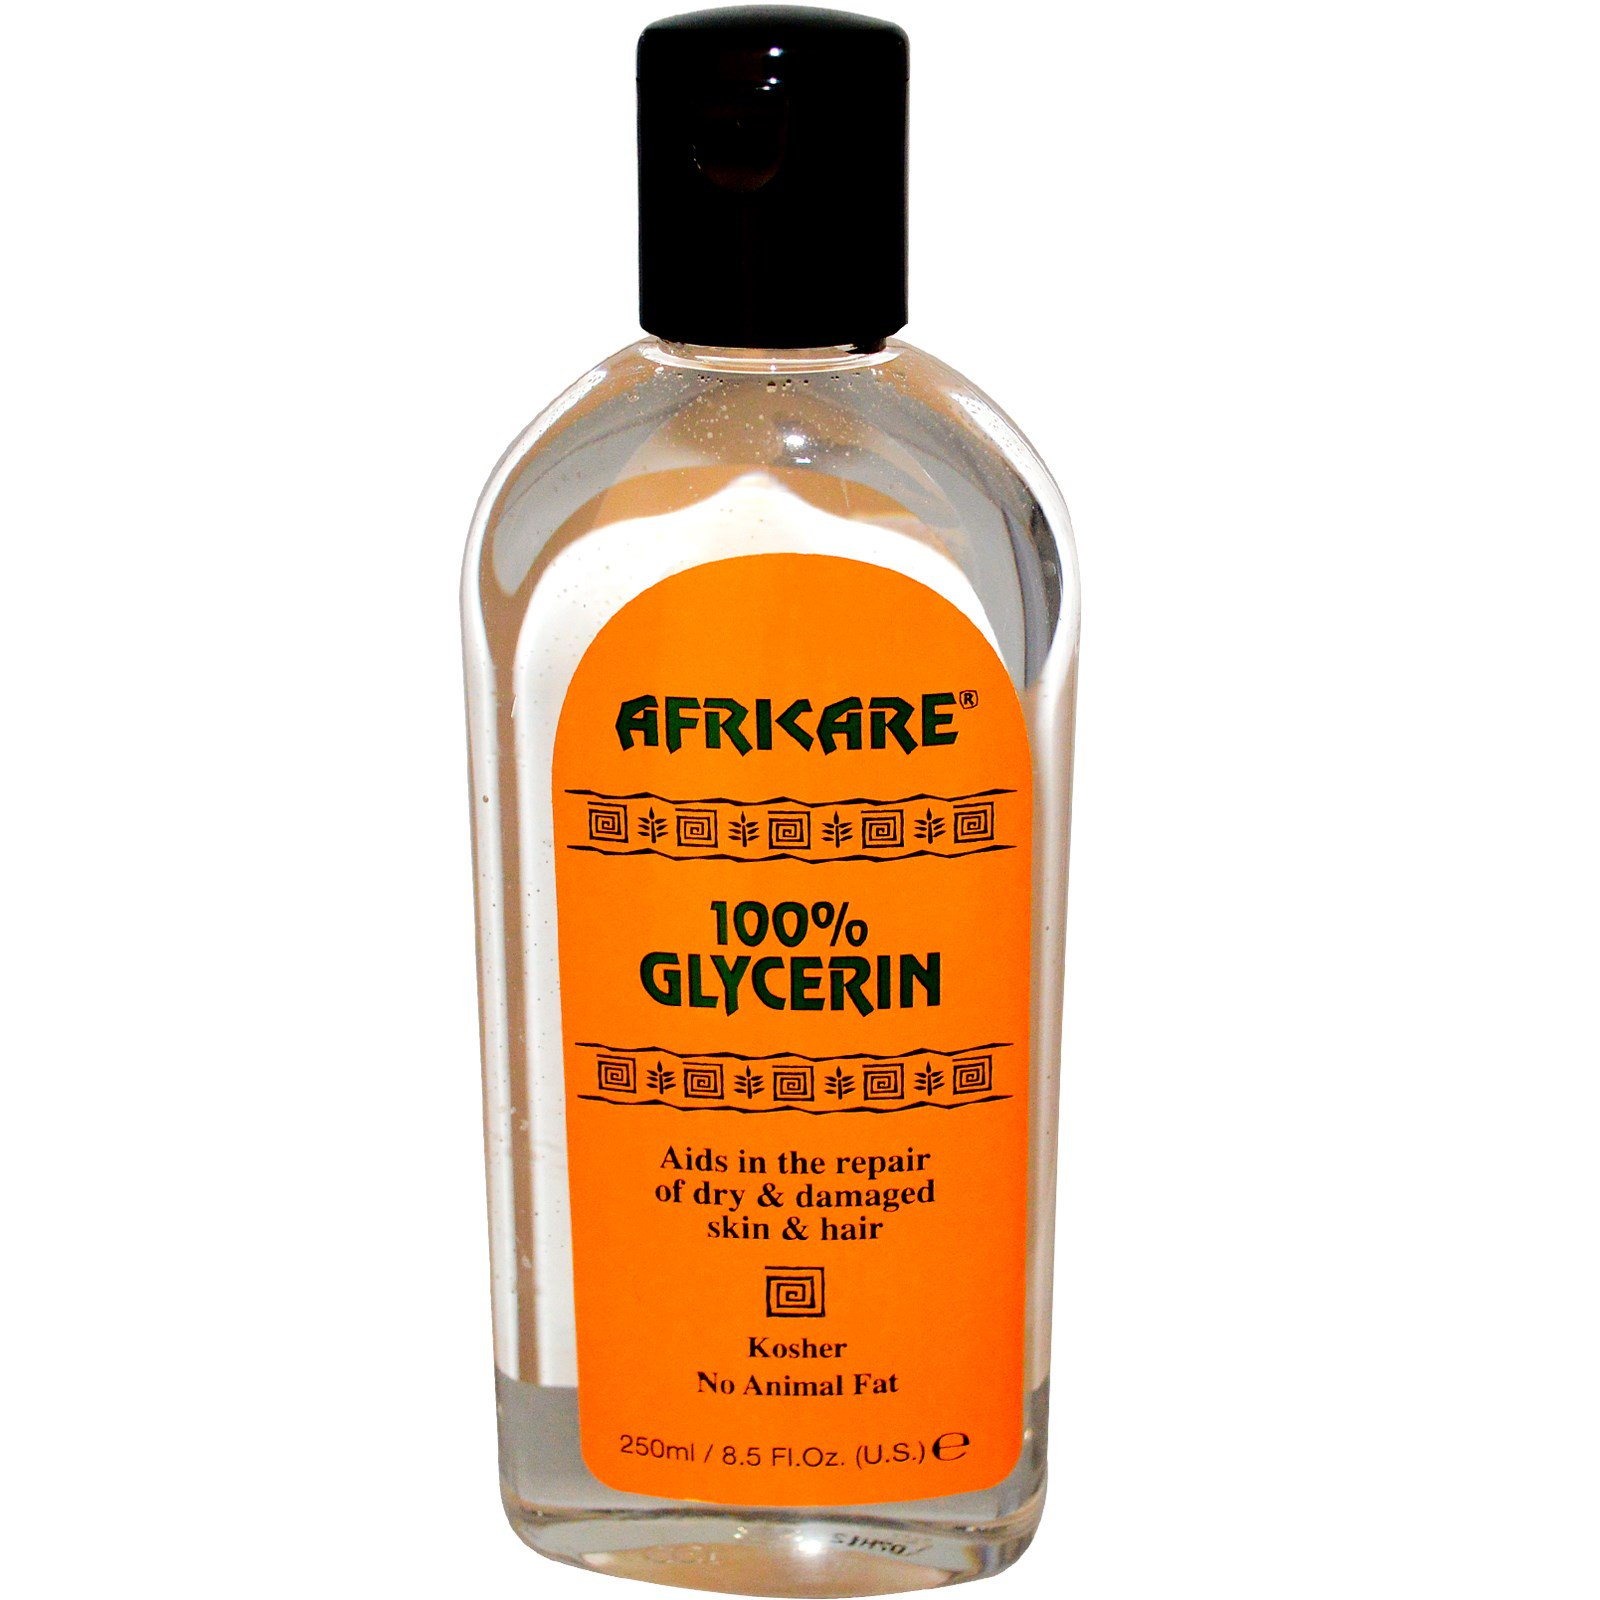 Cococare, Африкэр, 100% Глицерин, 250 мл (8,5 жидких унций)